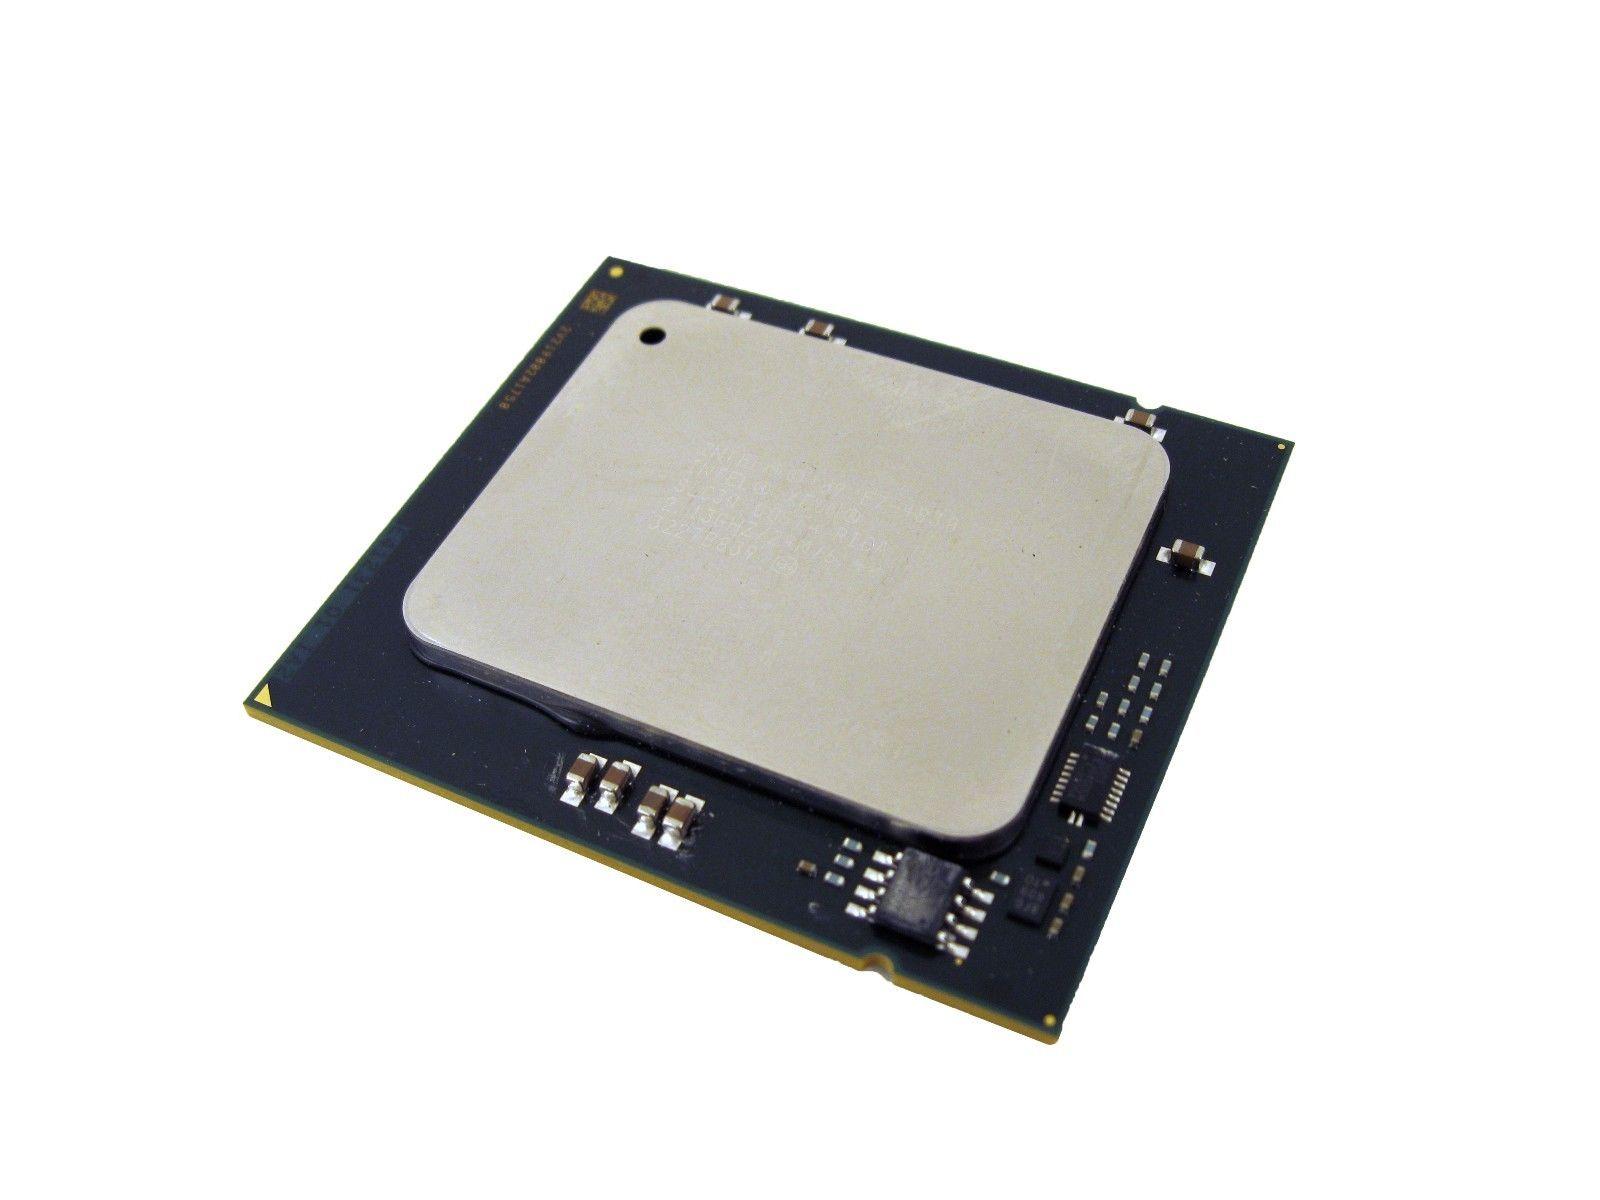 Intel SLC3Q Xeon E7-4830 2.13GHz CPU Processor